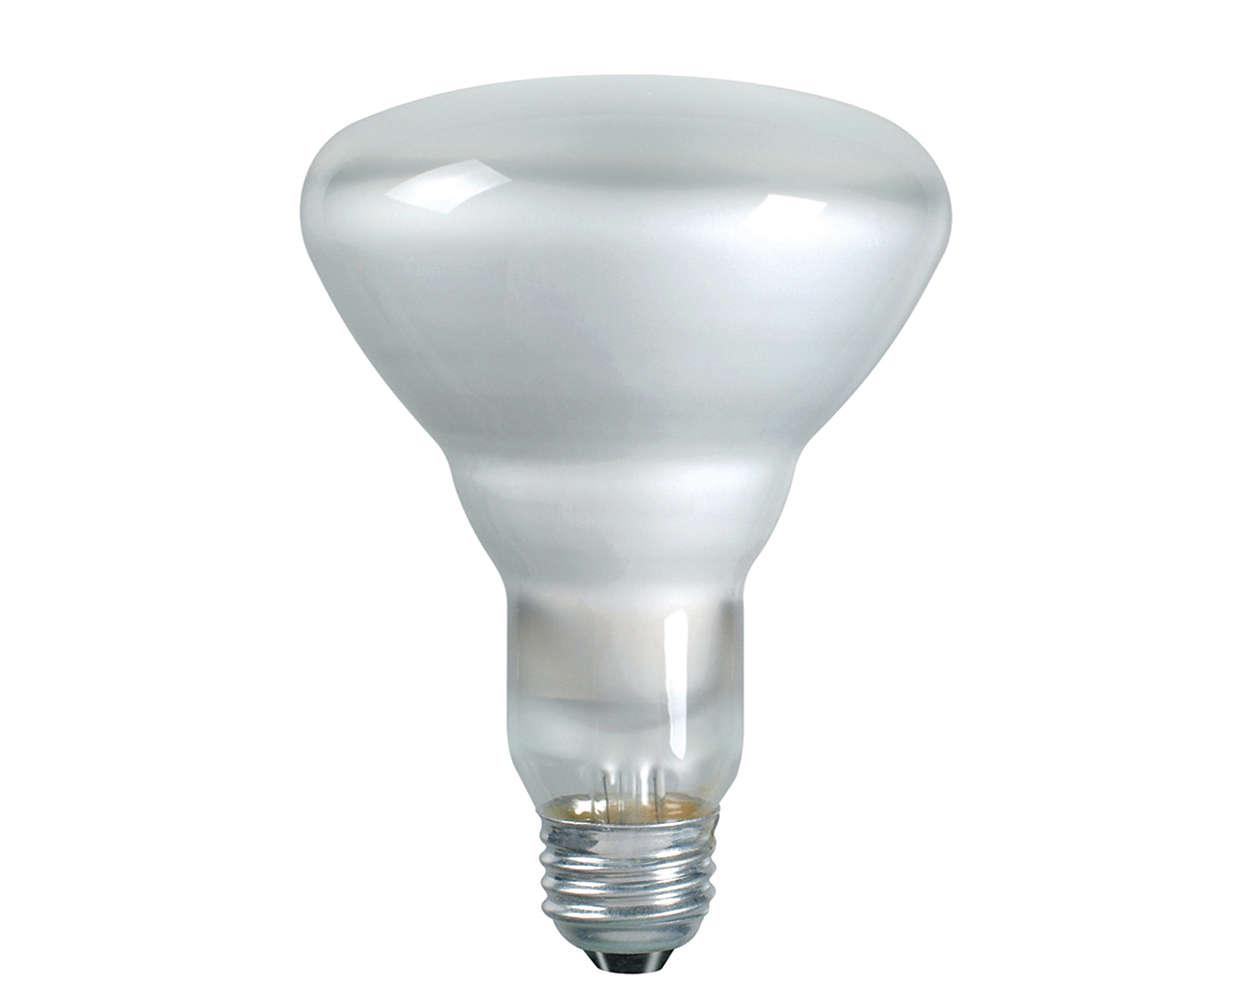 Duramax Indoor Flood Light 046677139278 Philips